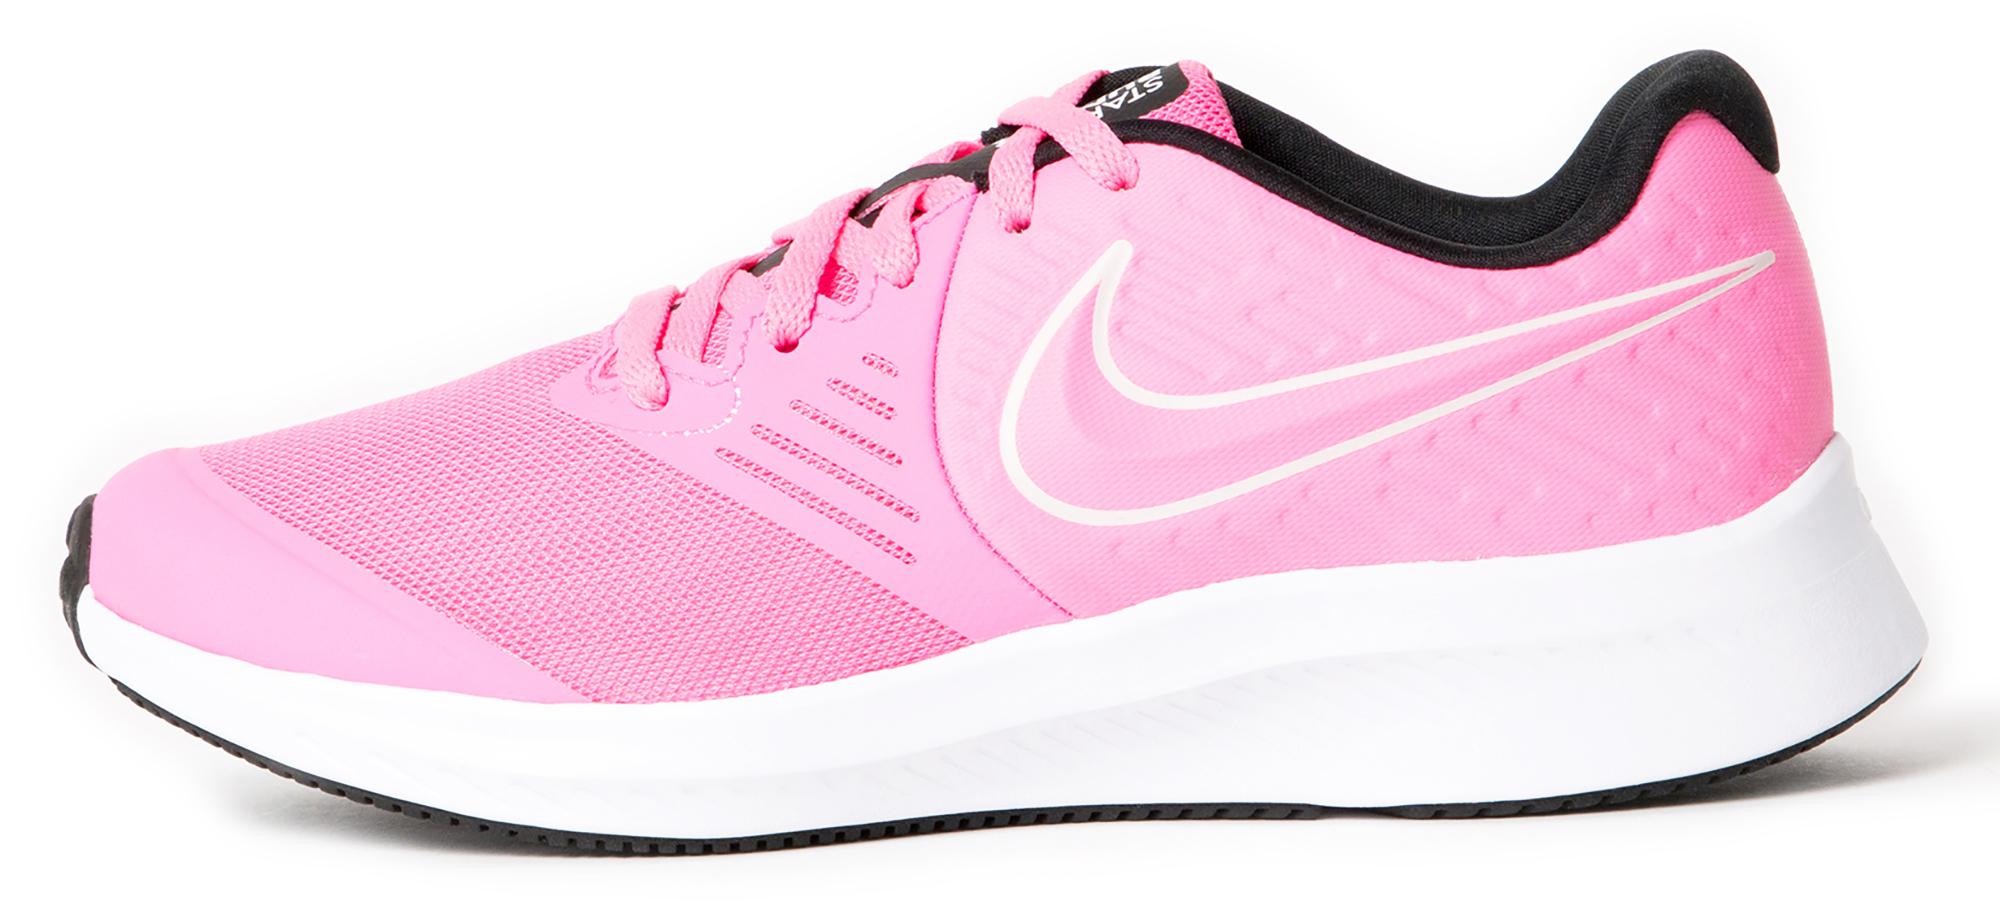 Nike Кроссовки для девочек Nike Star Runner 2 (Gs), размер 36.5 одежда для занятий баскетболом nike 005027 11 diy